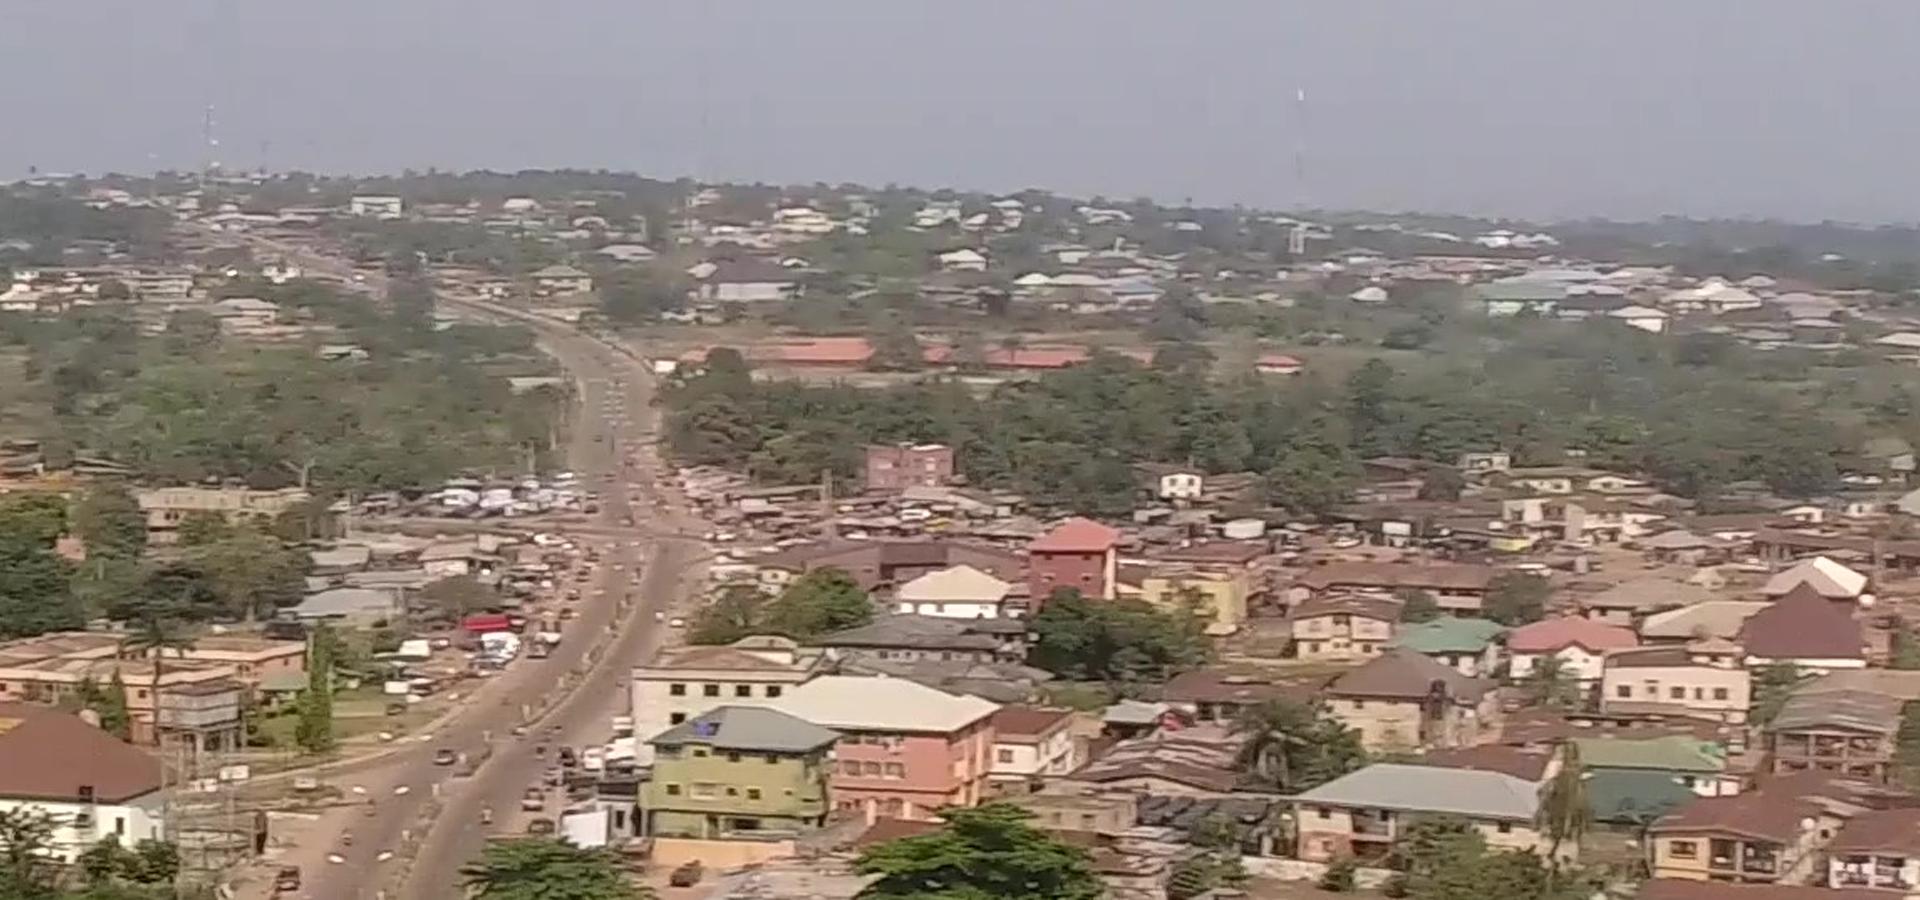 Peer-to-peer advisory in Auchi, Edo State, Nigeria